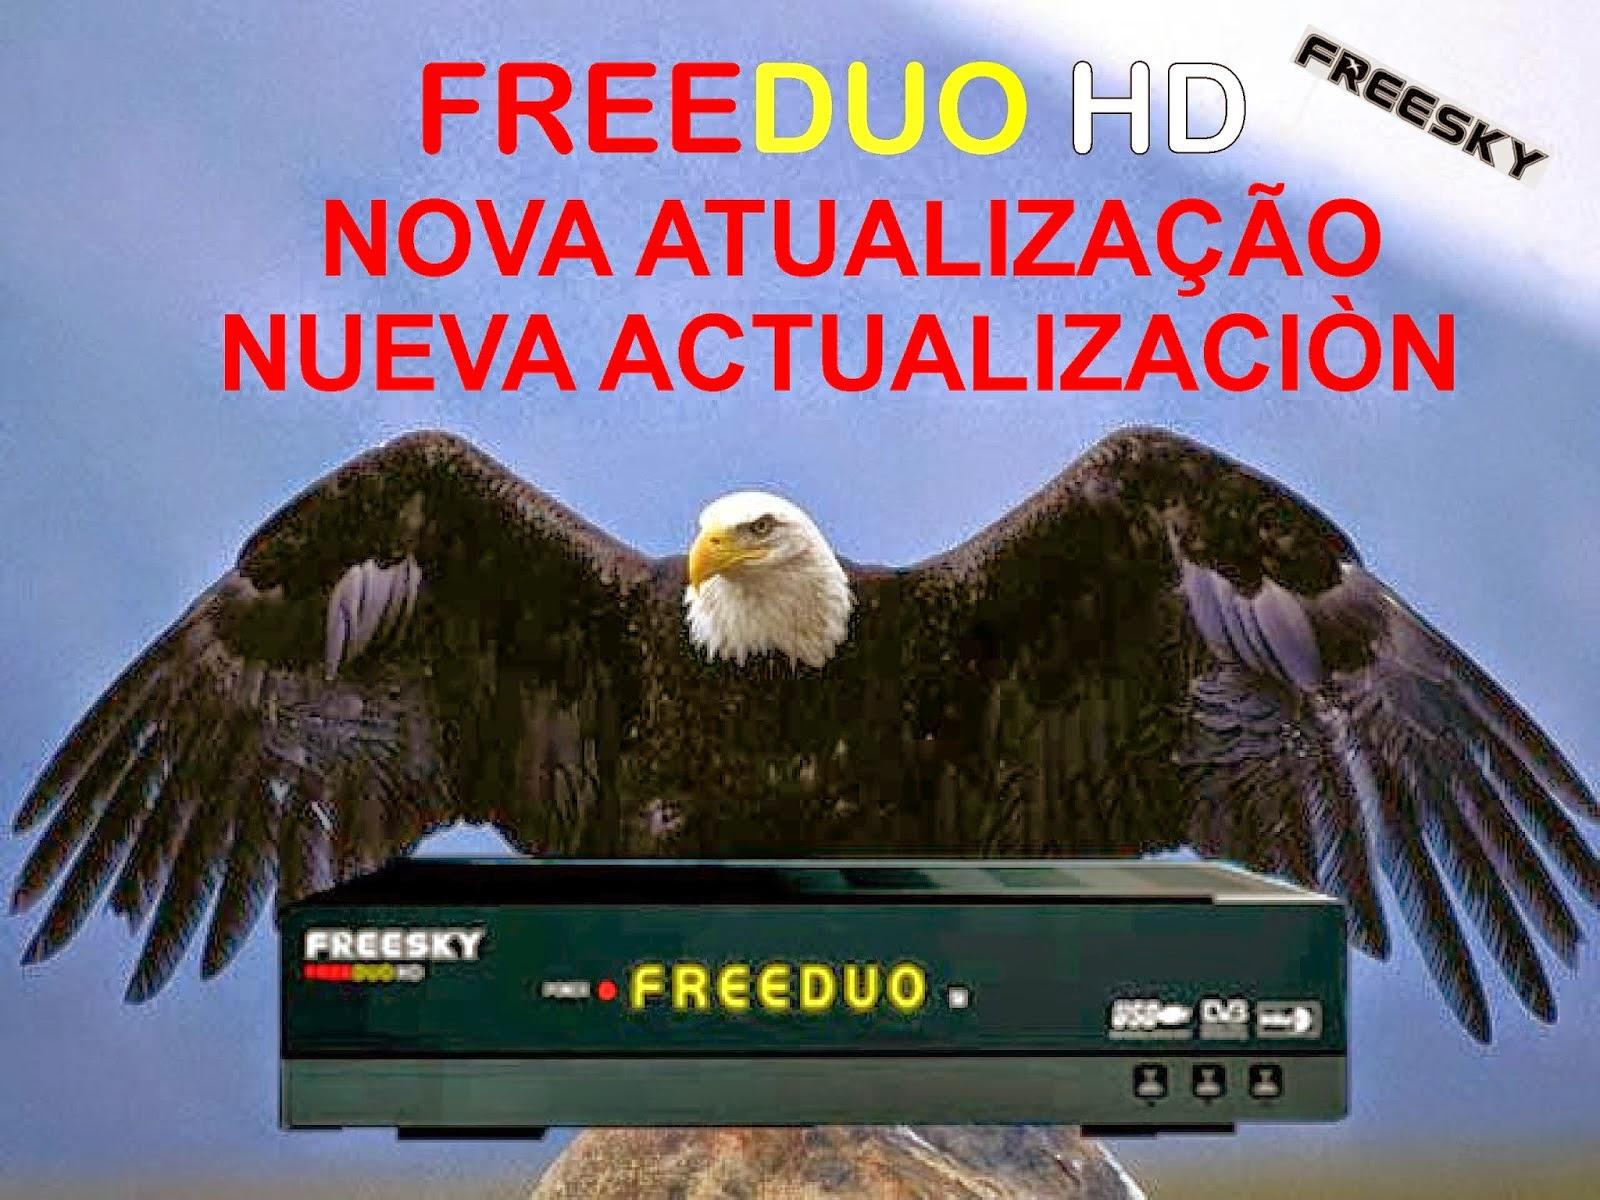 ����� ���� ����� ������ freesky 0act.jpg